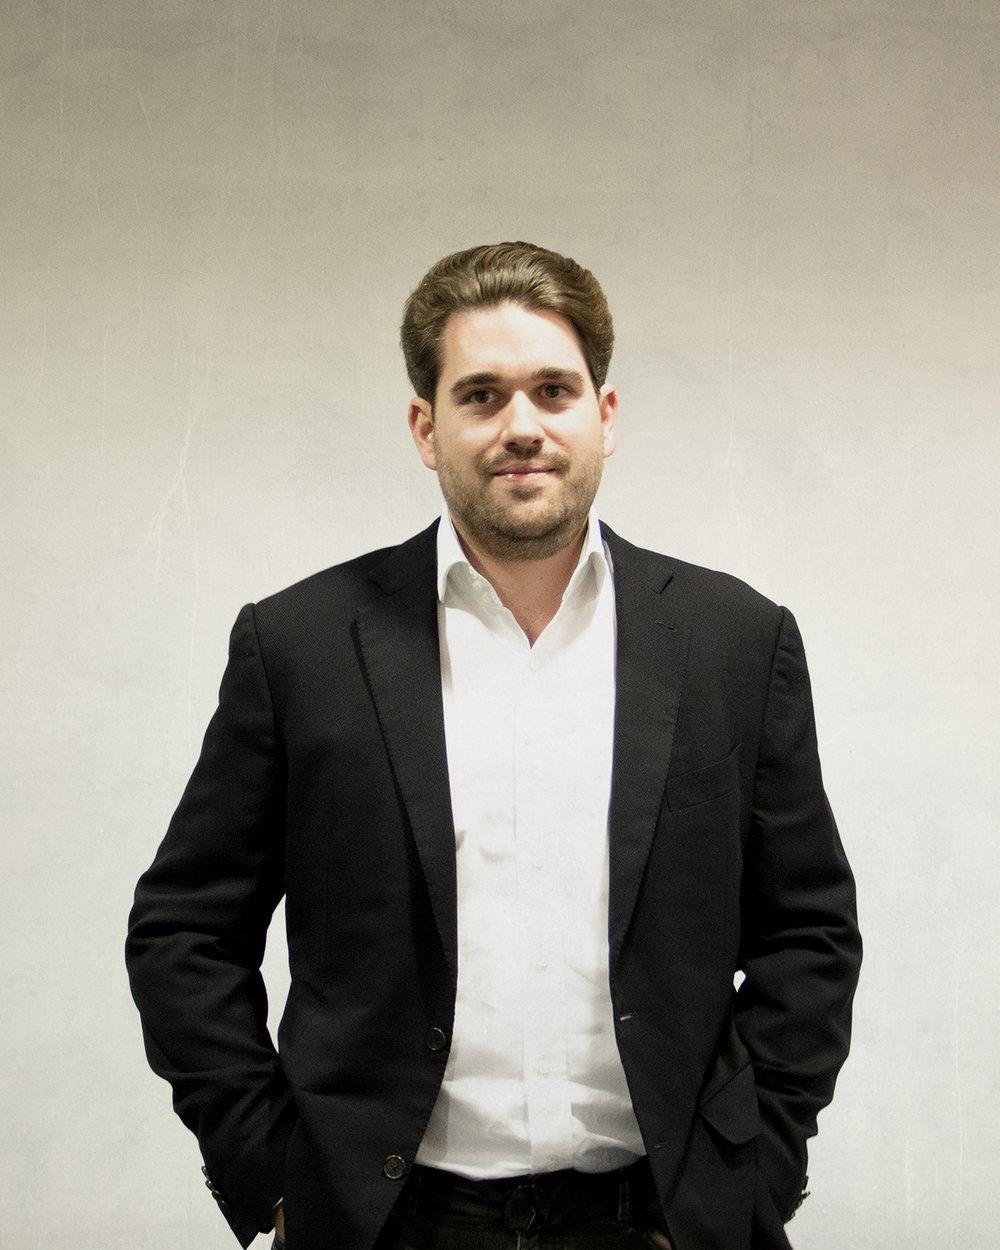 DANIEL KELTSCHA  General Director & Head of Sales  T: +43 1 318 55 22-210 F: +43 1 318 55 22-900 E:  daniel.keltscha@multigate.at